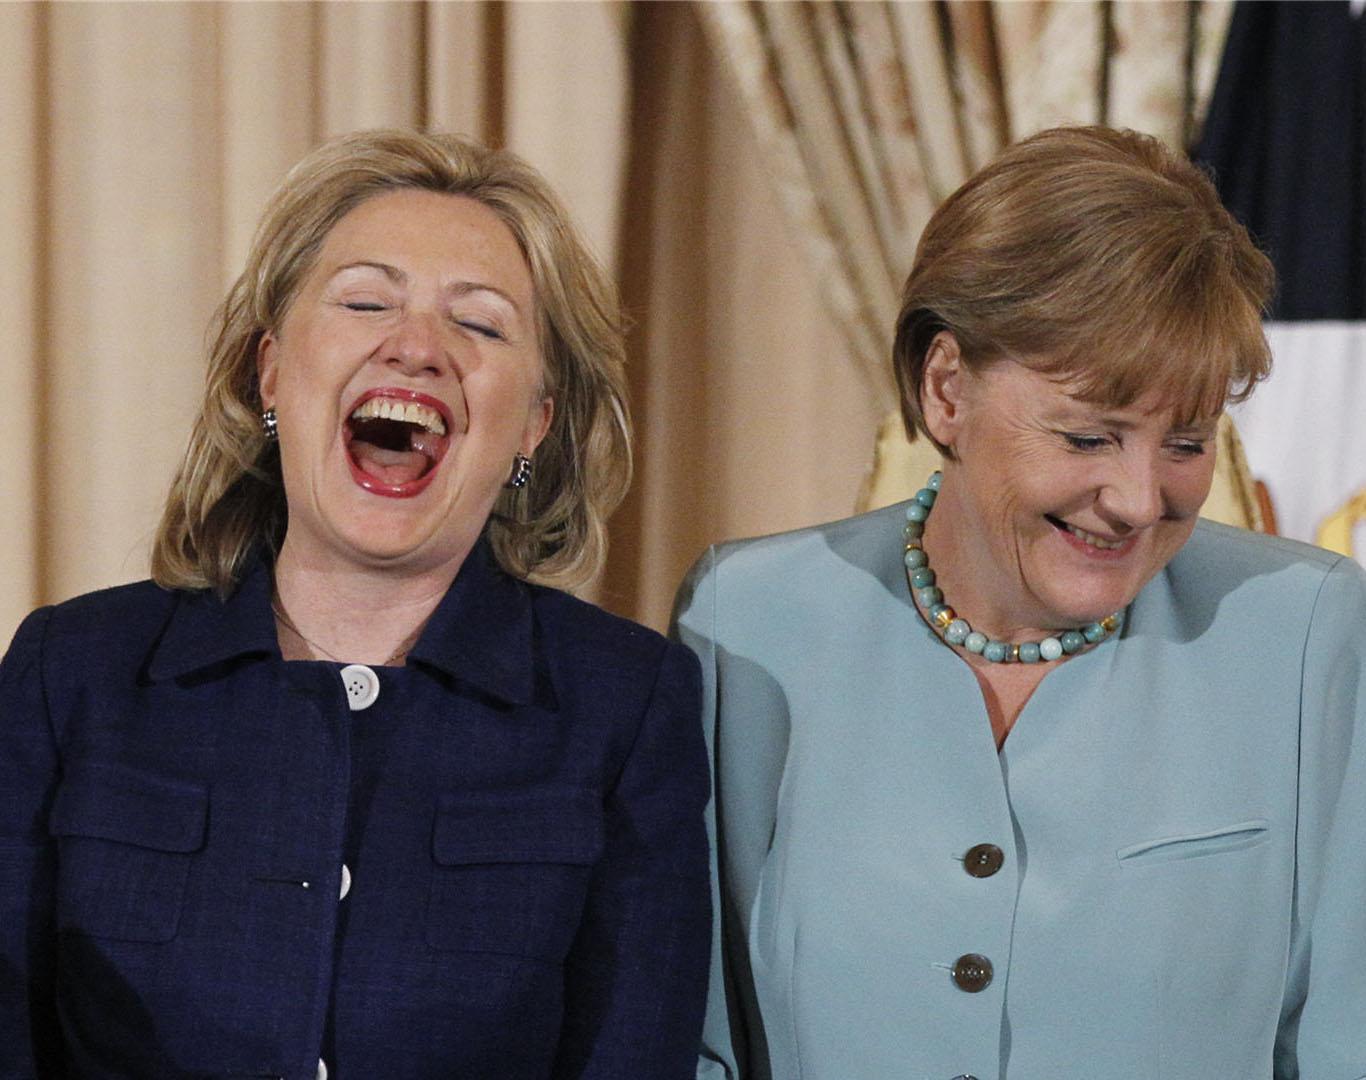 http://1.bp.blogspot.com/-eNV8YlU_5IQ/UC-lerlu5AI/AAAAAAAAAiw/althd4qlH4c/s1600/Hillary-Clinton-Laughing-Wallpaper-1920x1080.jpg